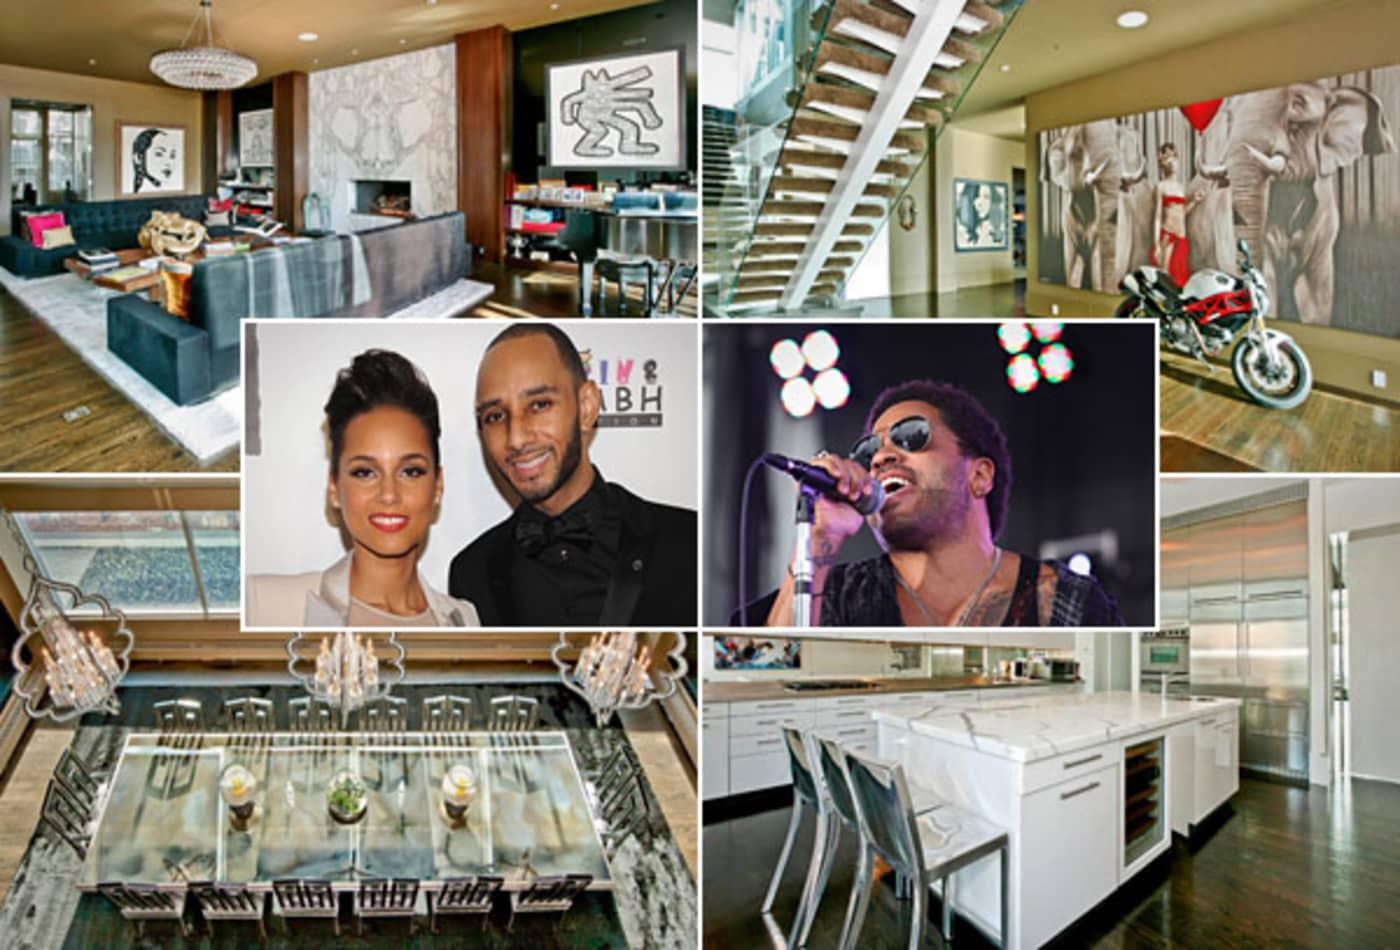 Alicia-Keys-Swizz-Beats-Lenny-Kravitz-Rock-Star-Homes.jpg